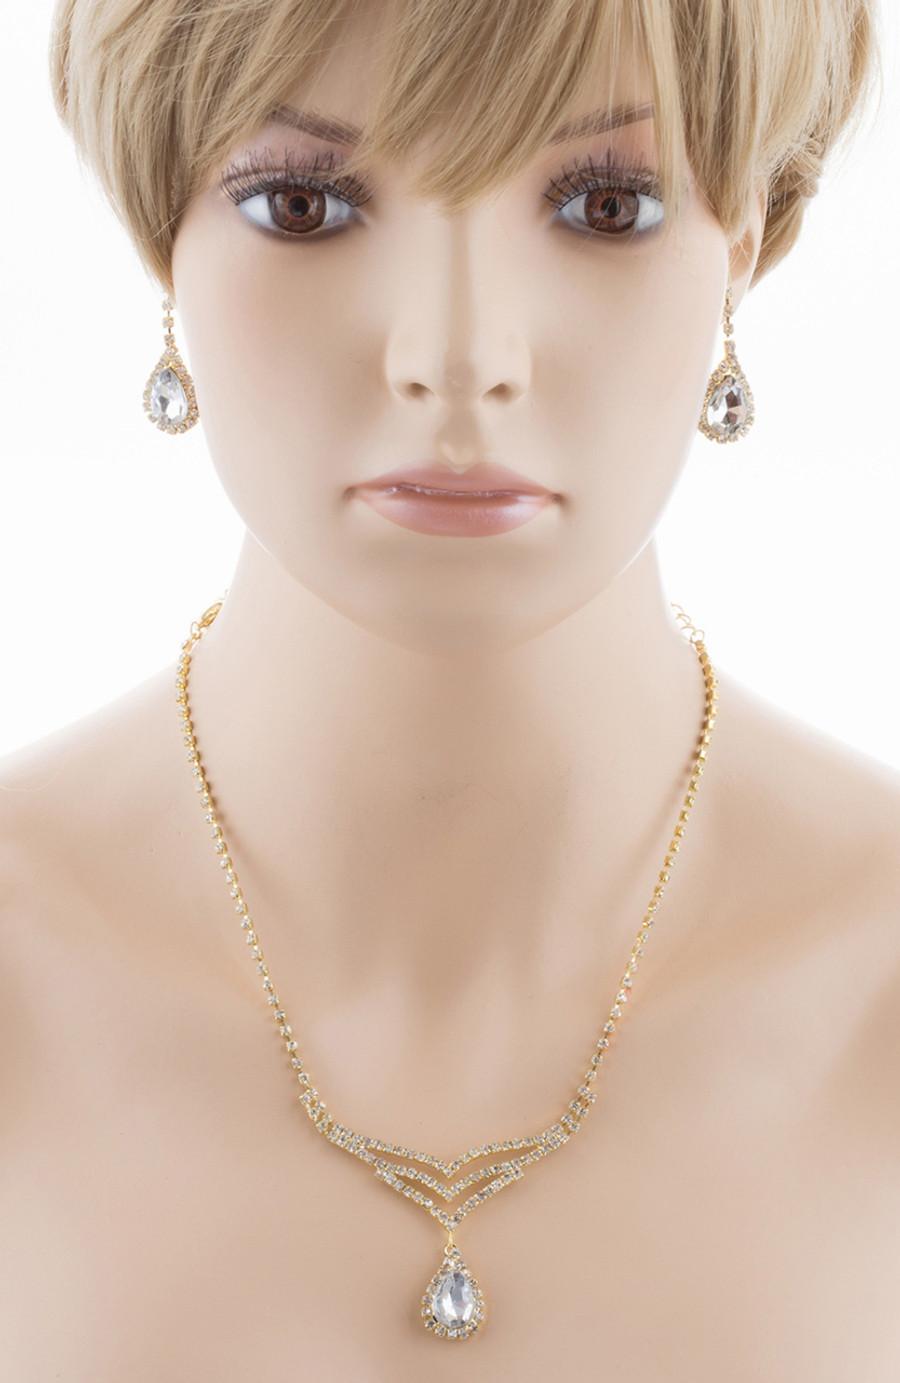 Bridal Wedding Jewelry Set Crystal Rhinestone Elegant TD V-Drop Necklace Gold